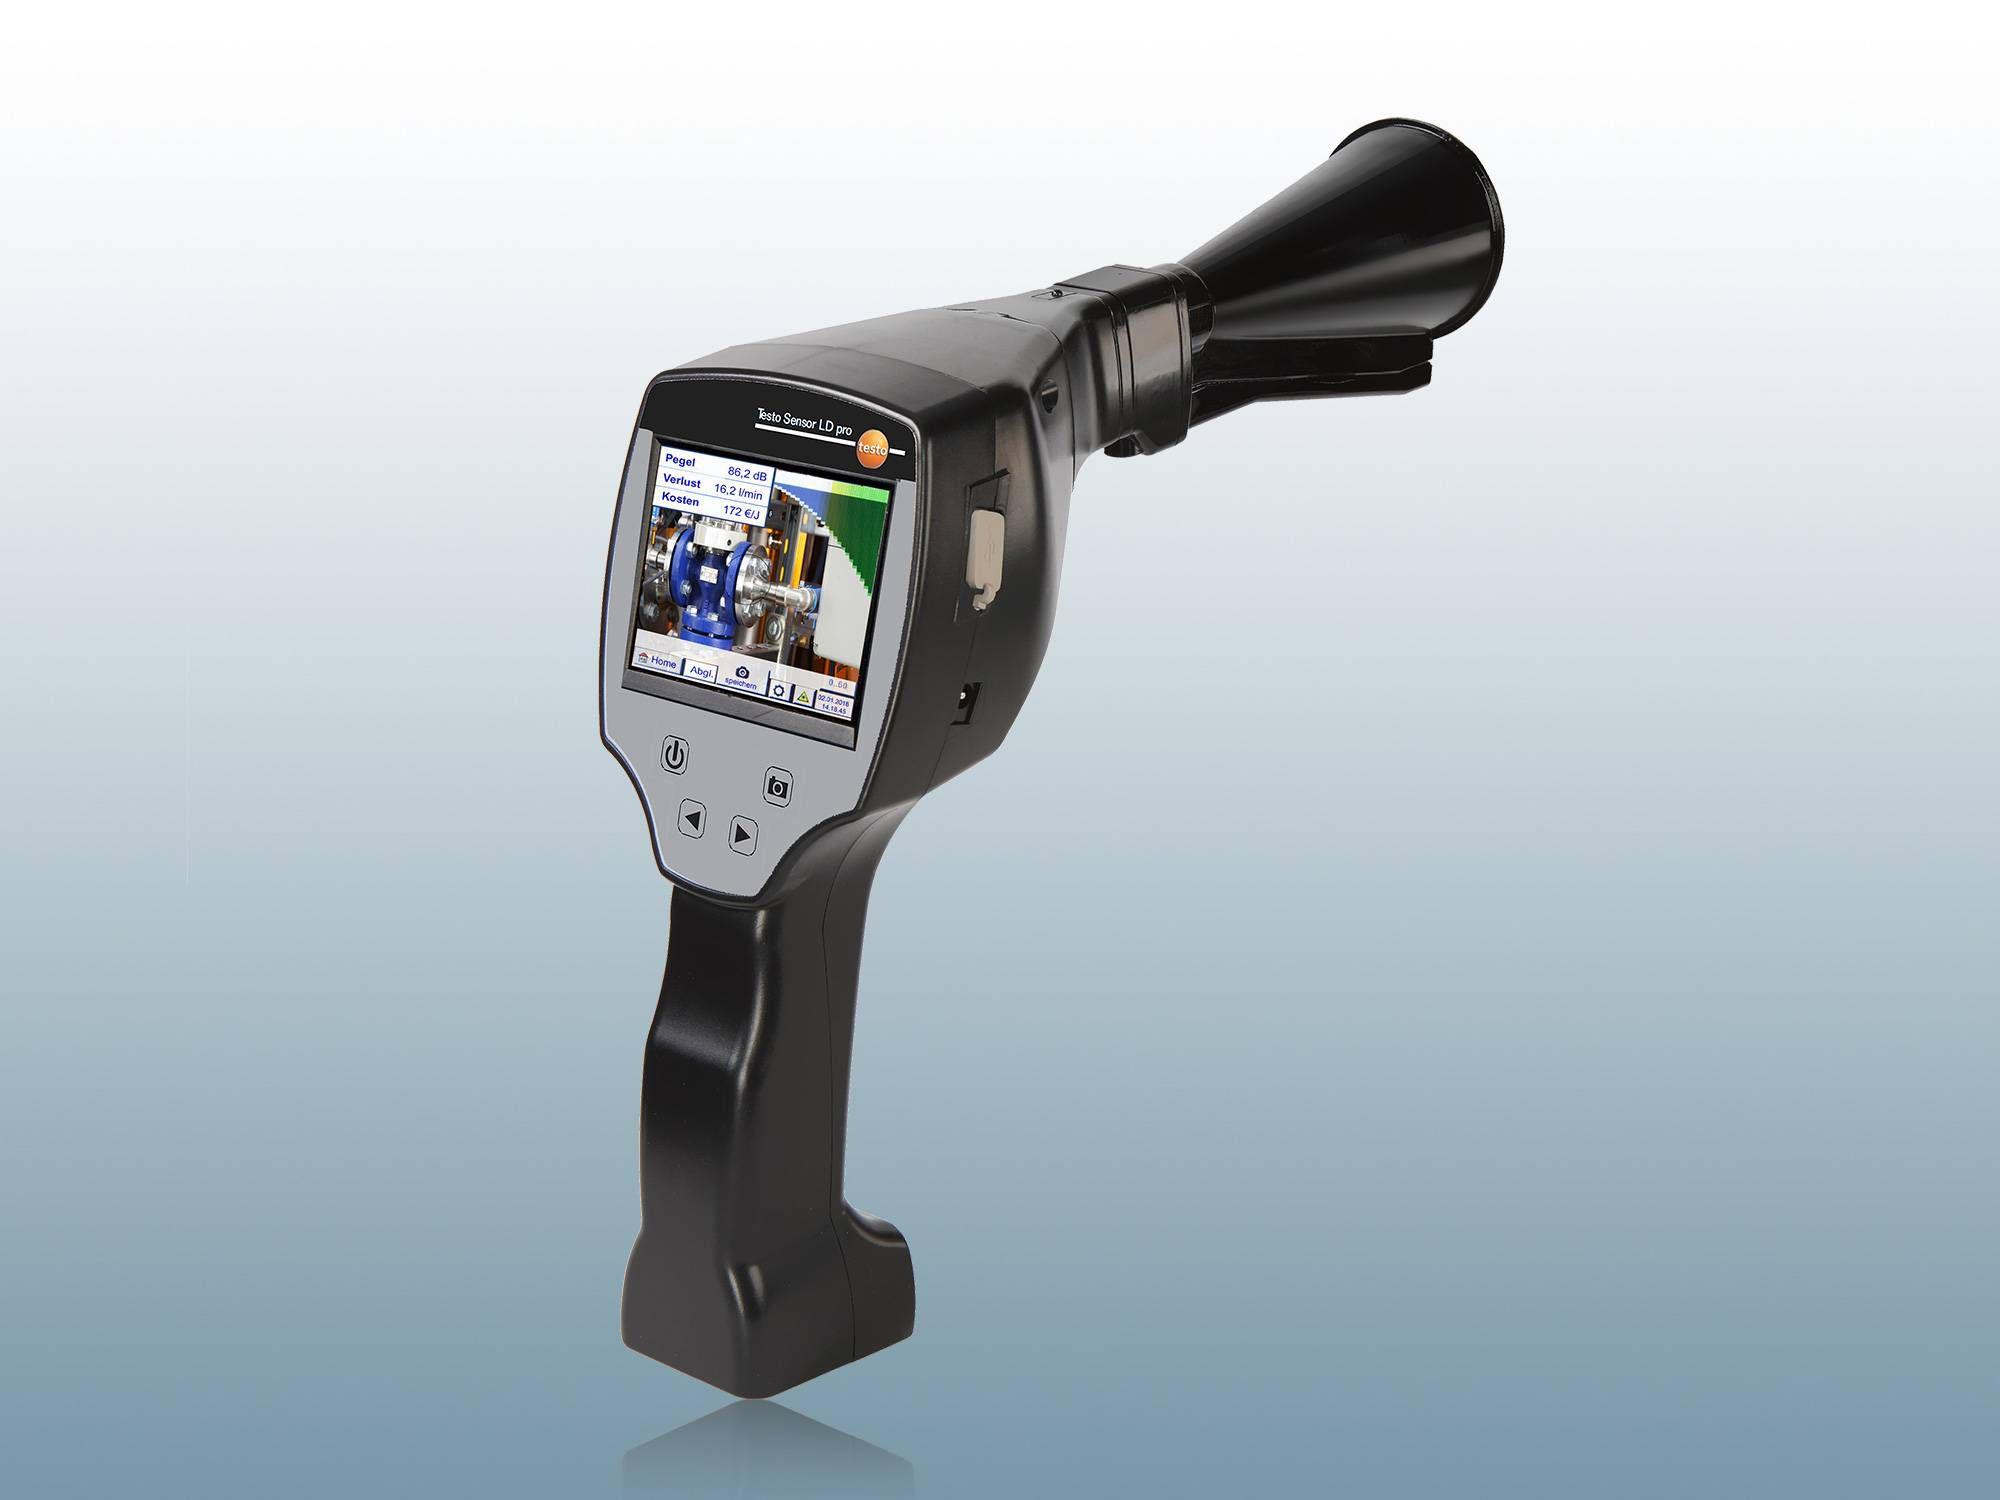 <p>testo Sensor LD pro</p><p>Leckage-Suchger&auml;t mit Kamera</p>